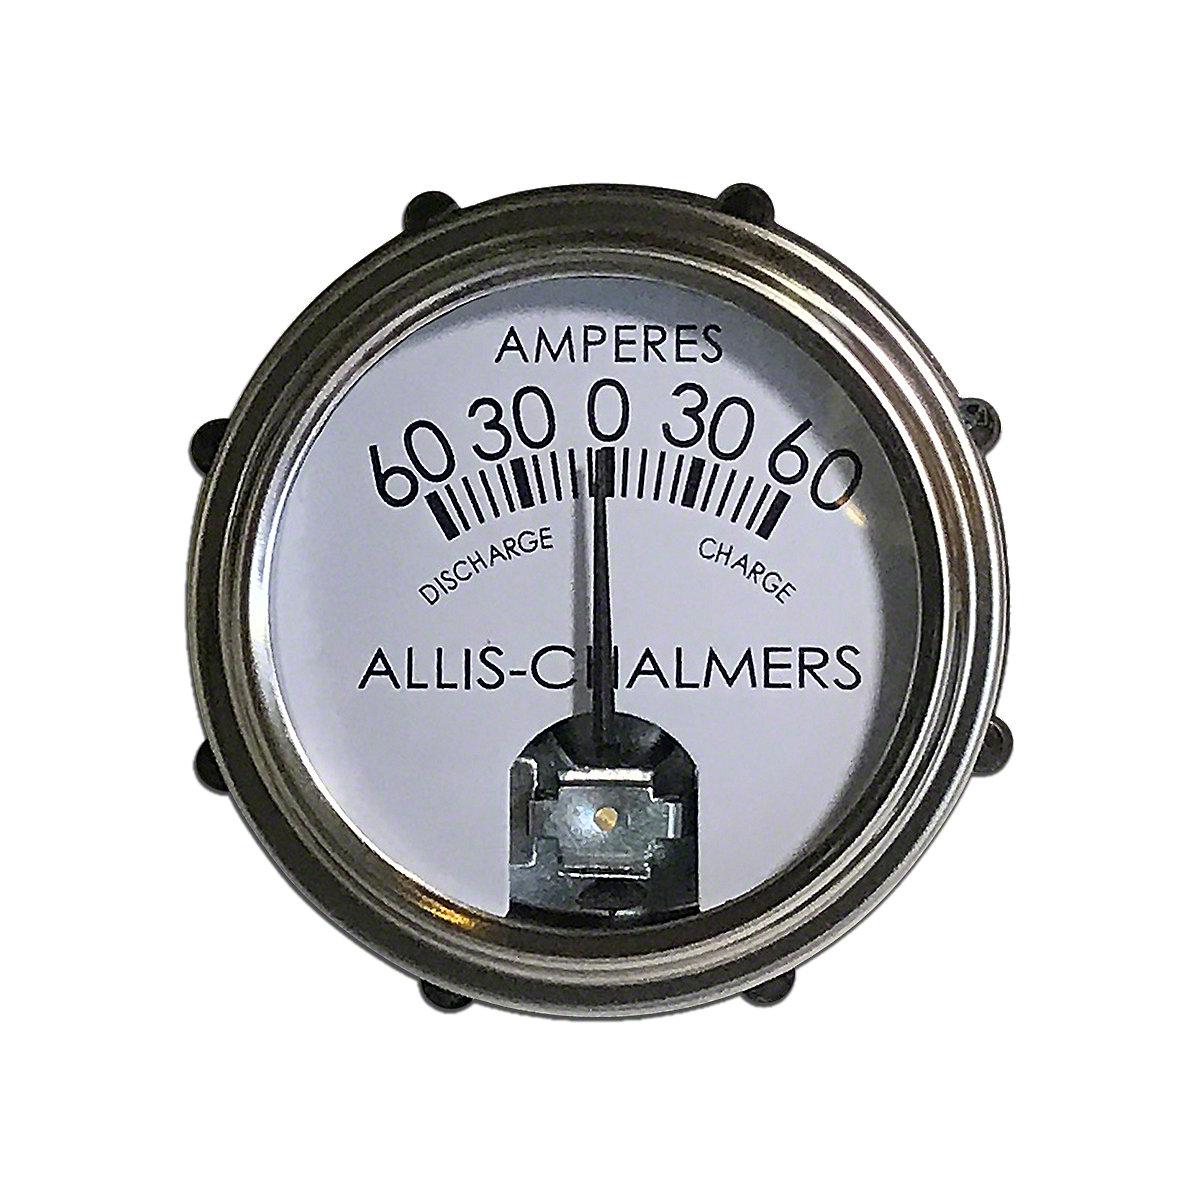 Allis Chalmers Ca 12 Volt 06 F250 Radio Wiring Diagram Honda Crv ...